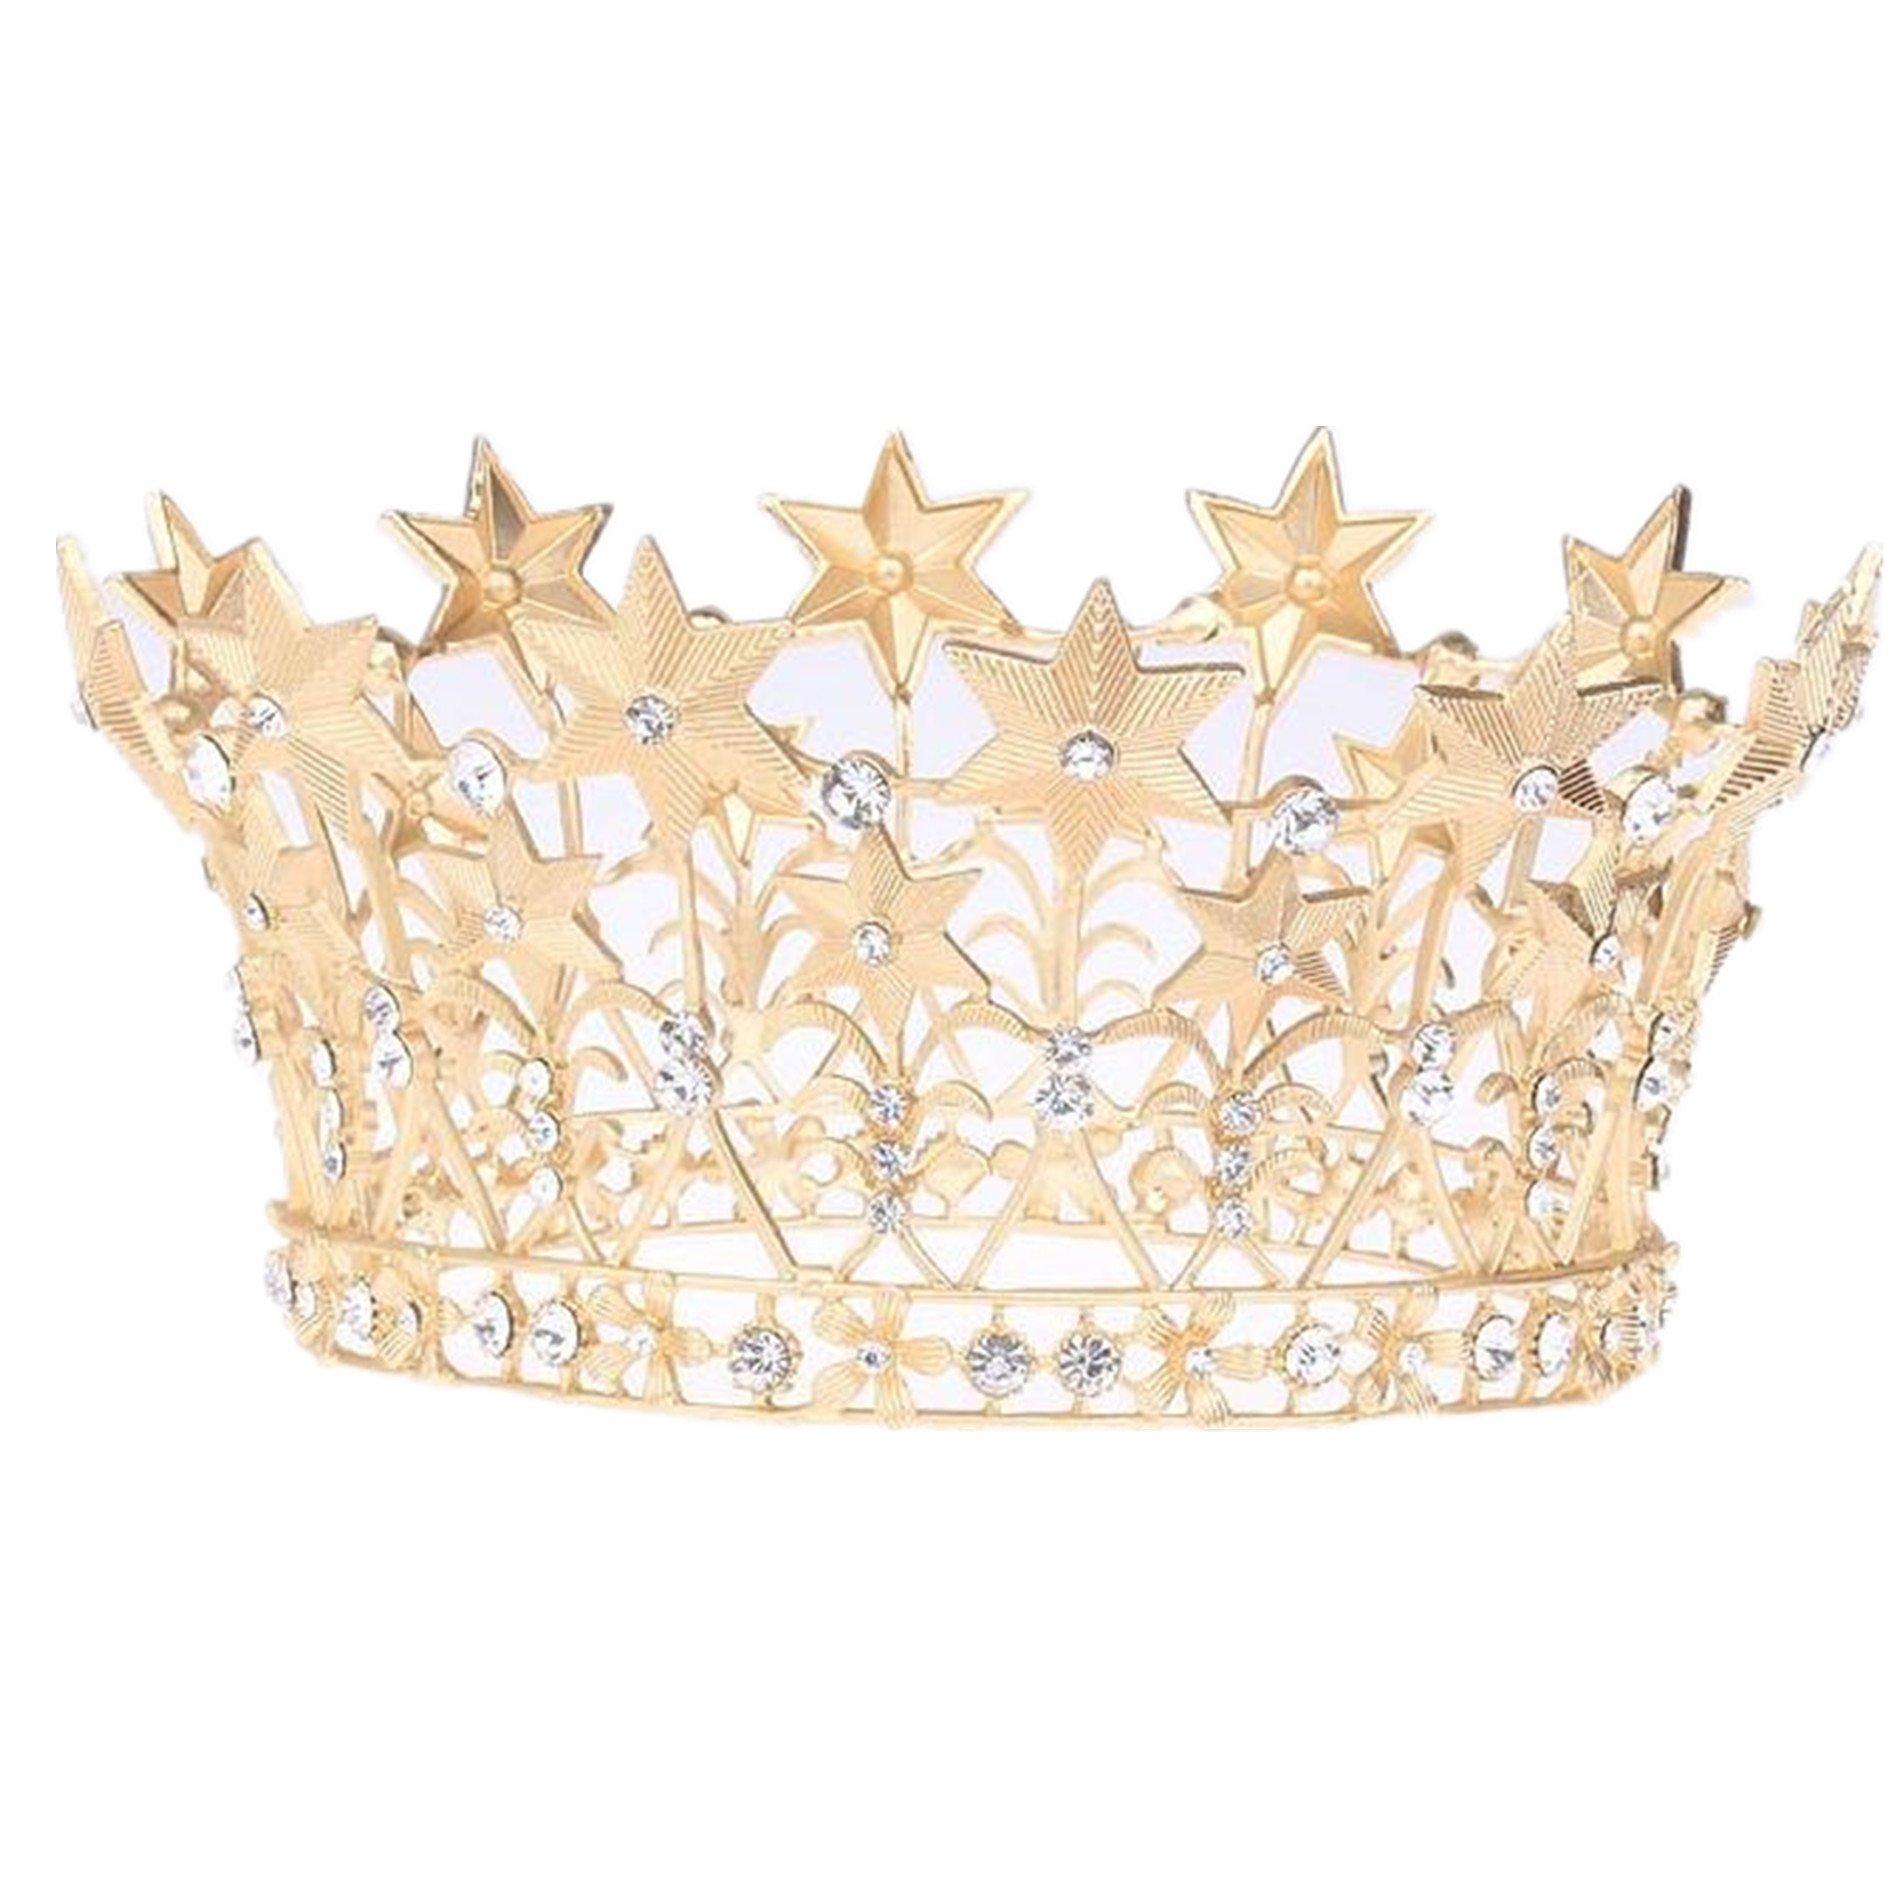 Wiipu Baroque Large Gold Full Circle Crystal Star Tiara Crown,4.7'' Diameter(A1701) (Gold)